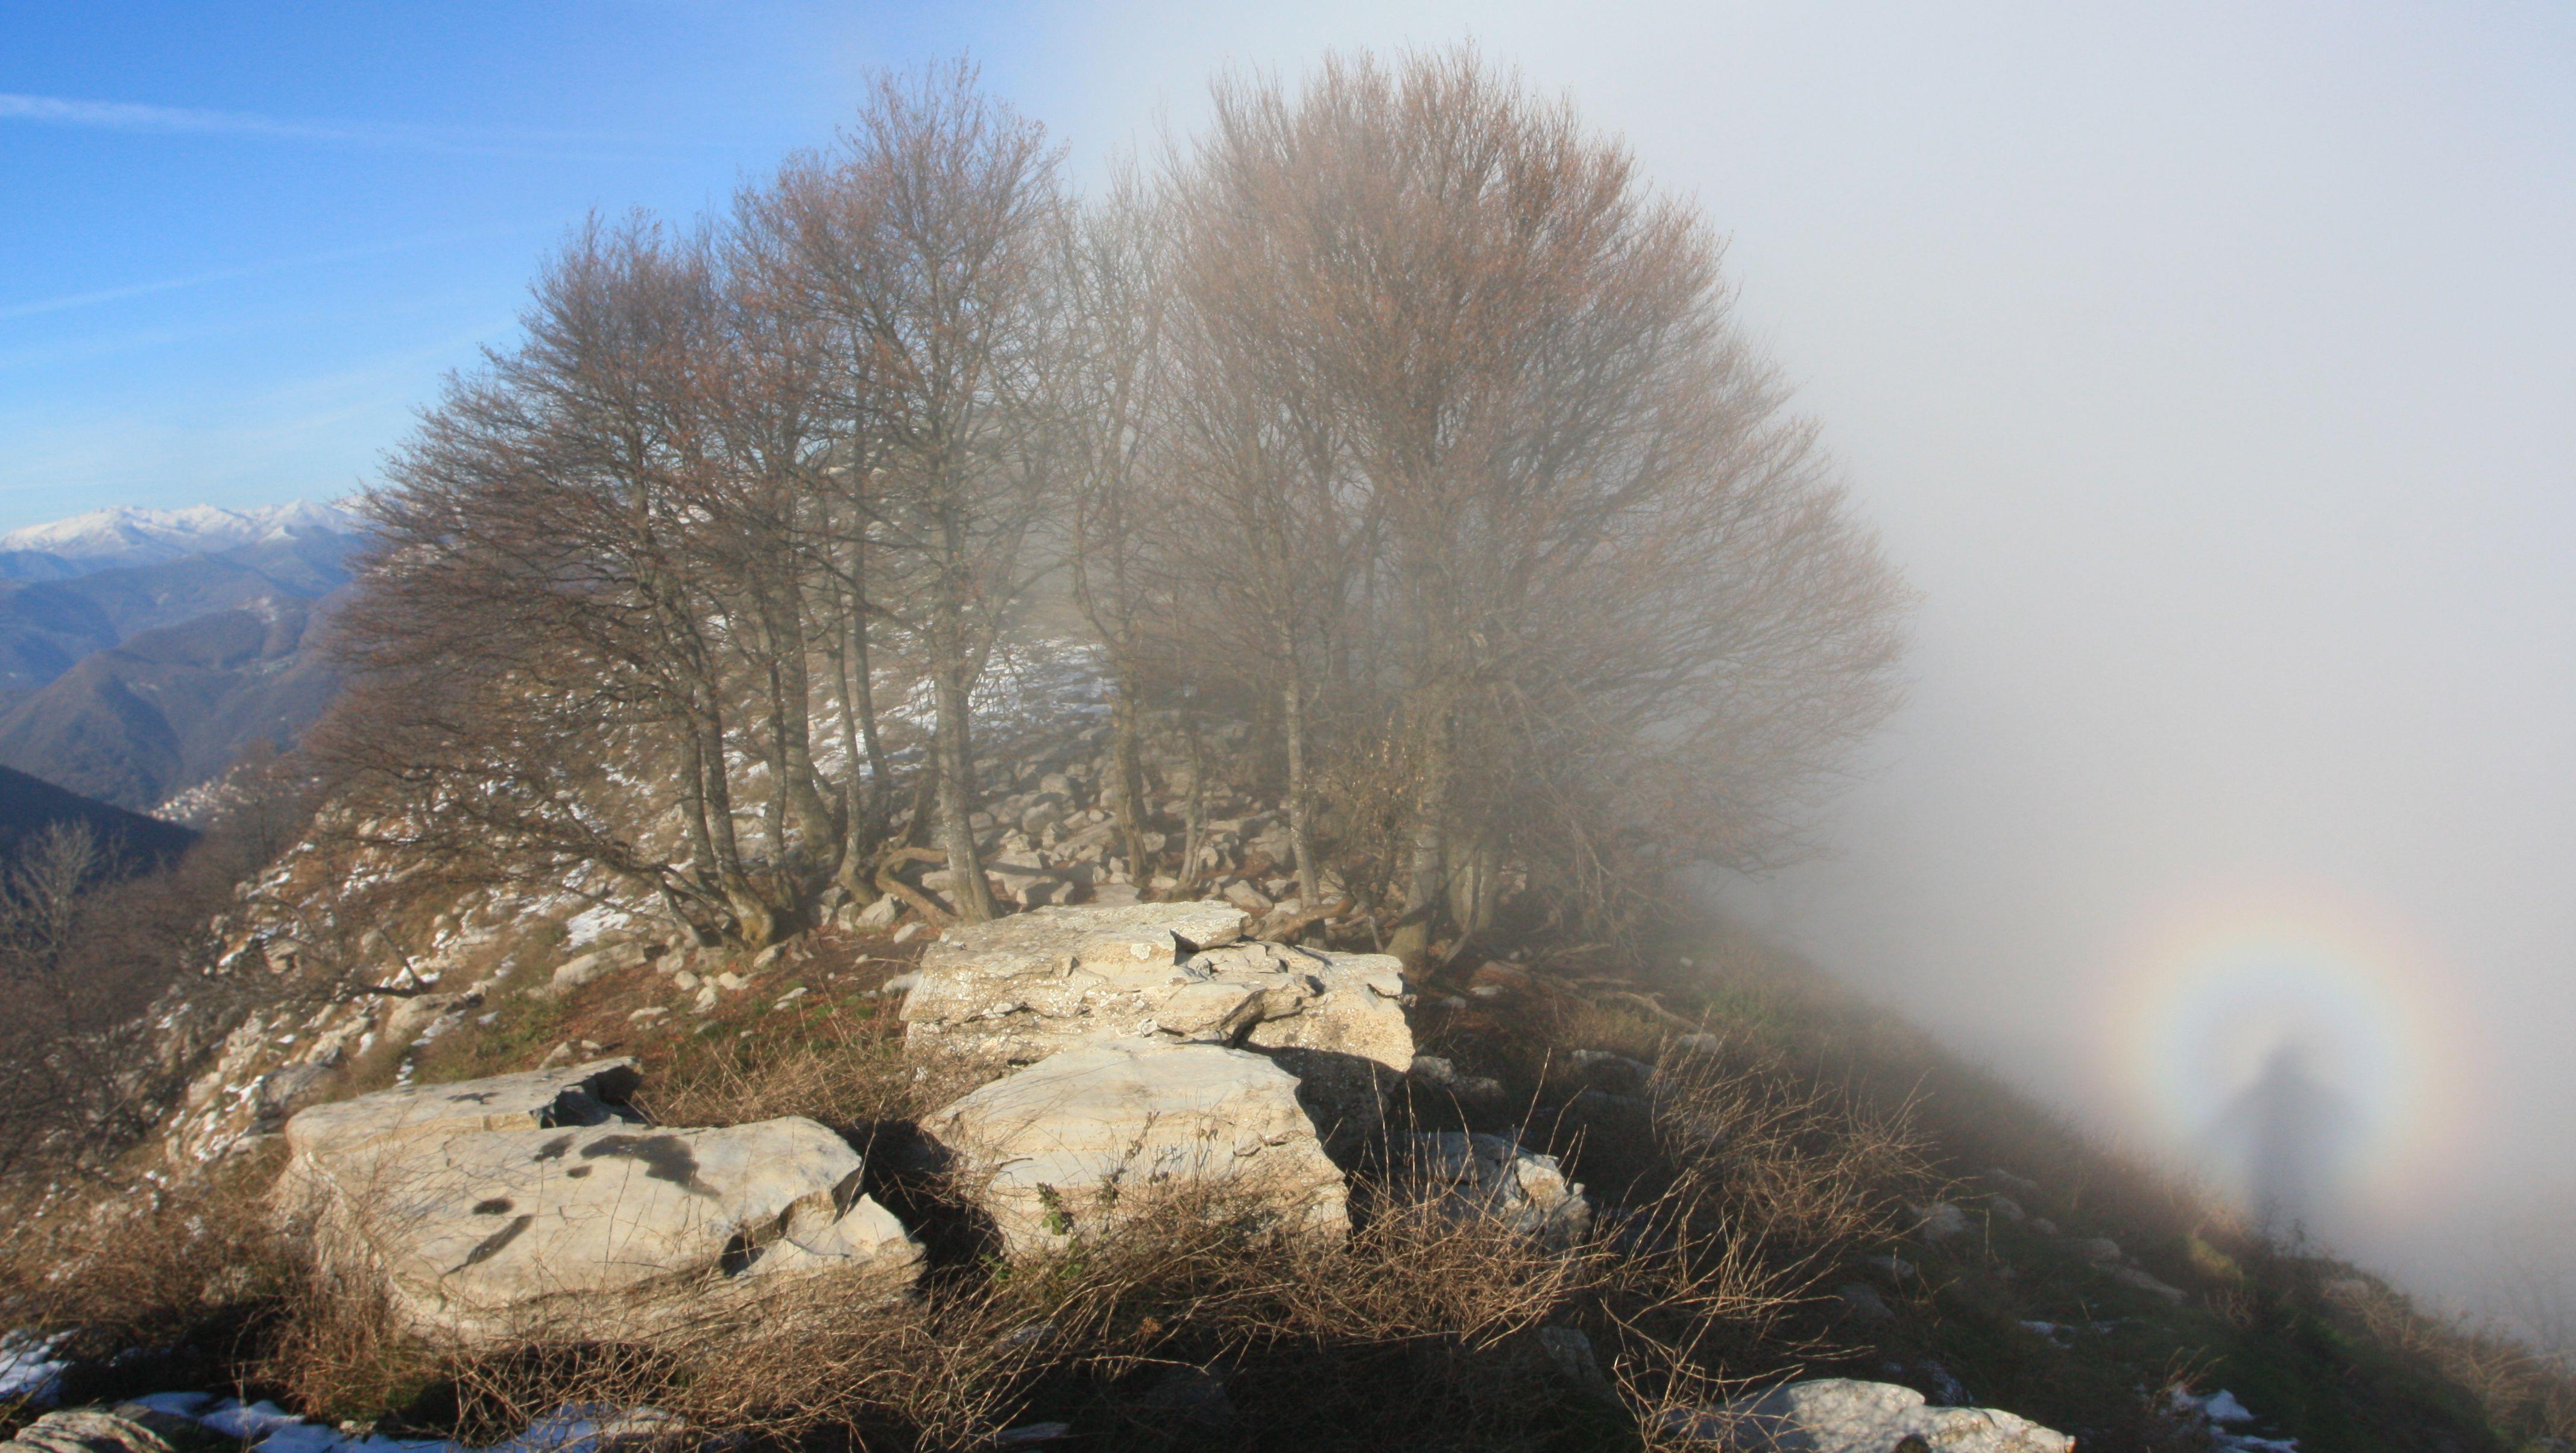 Brocken spectre on the Lombard Alps